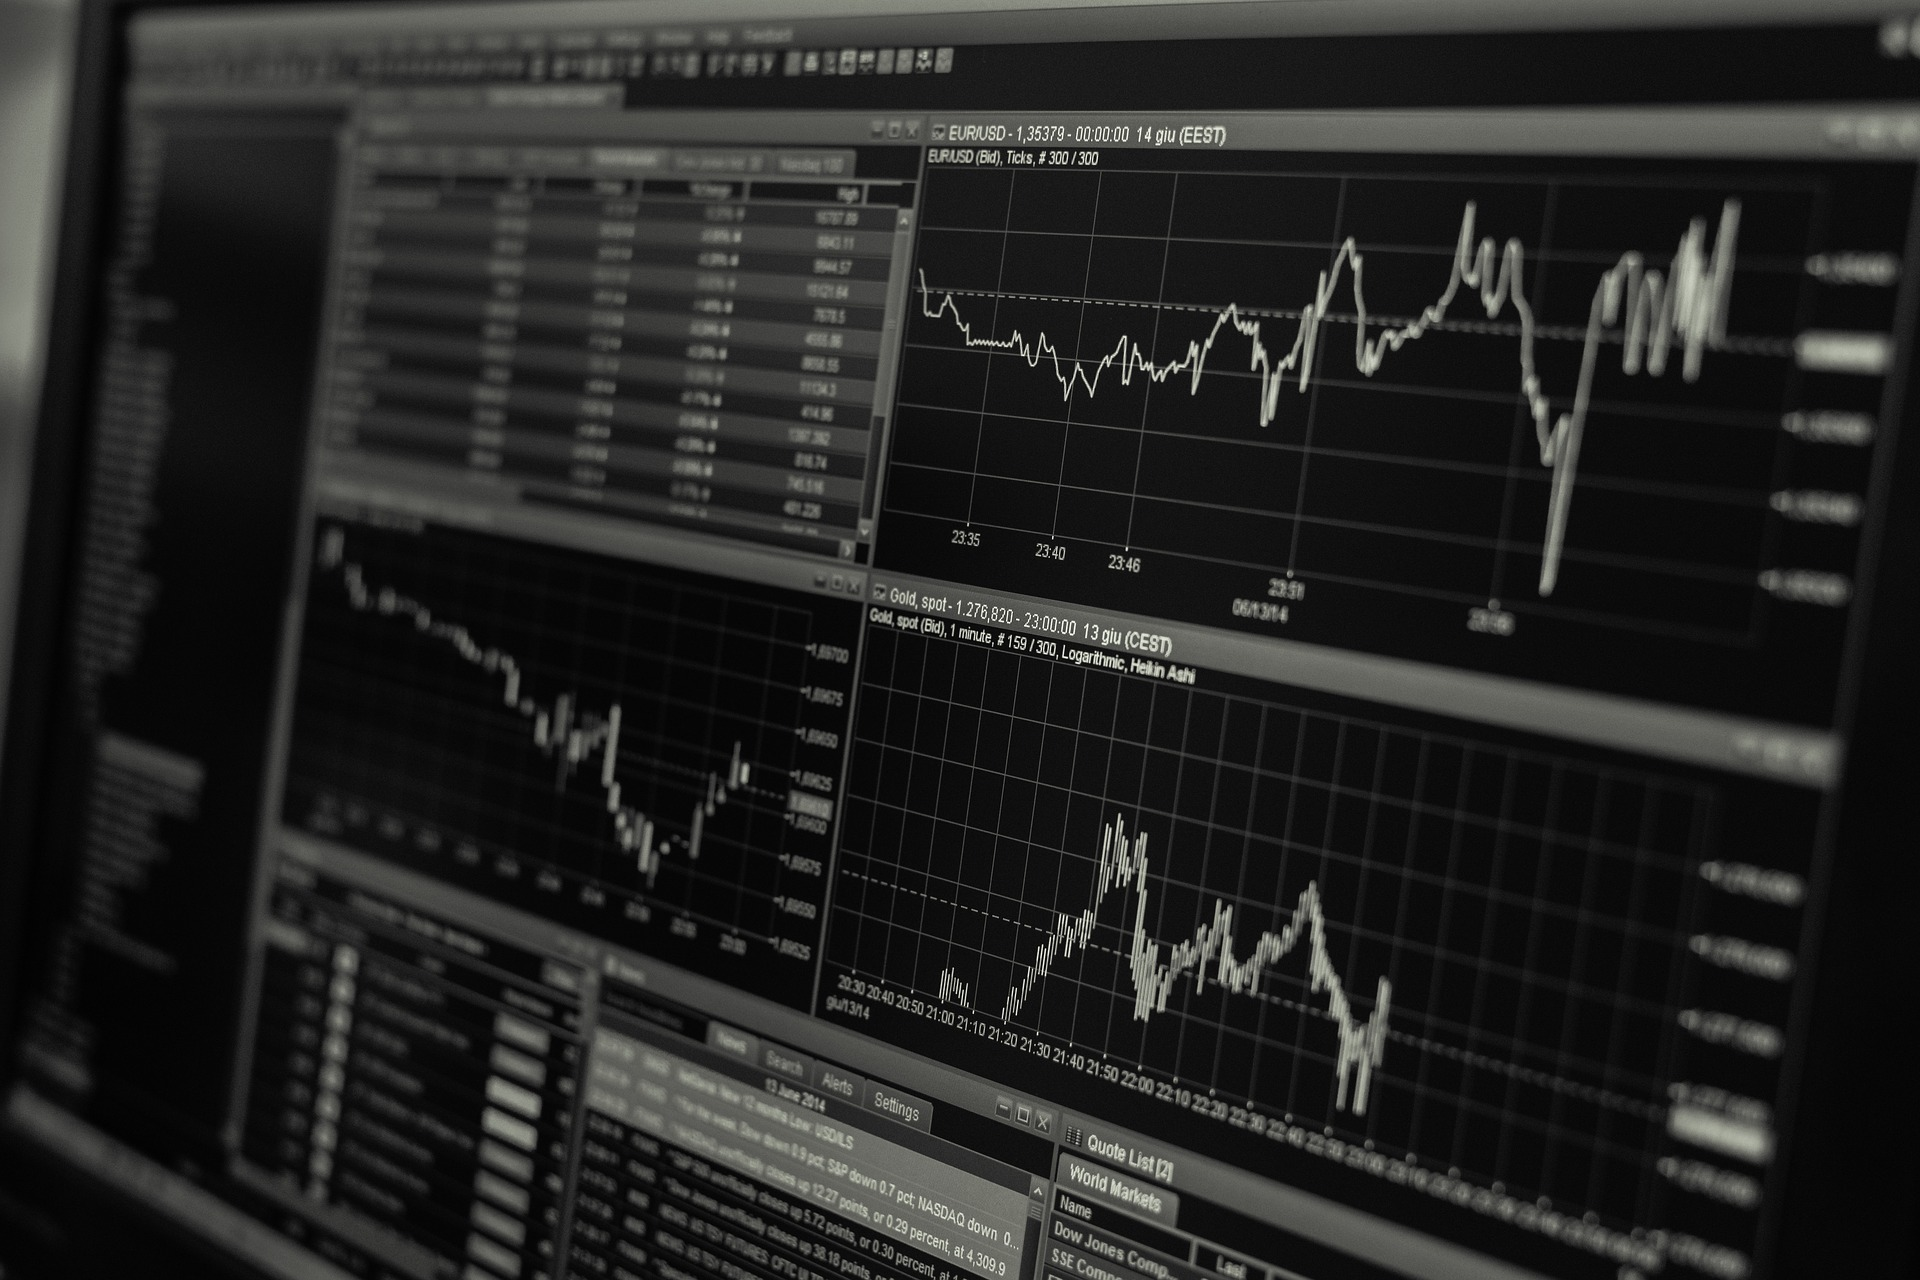 økonomi finans tal